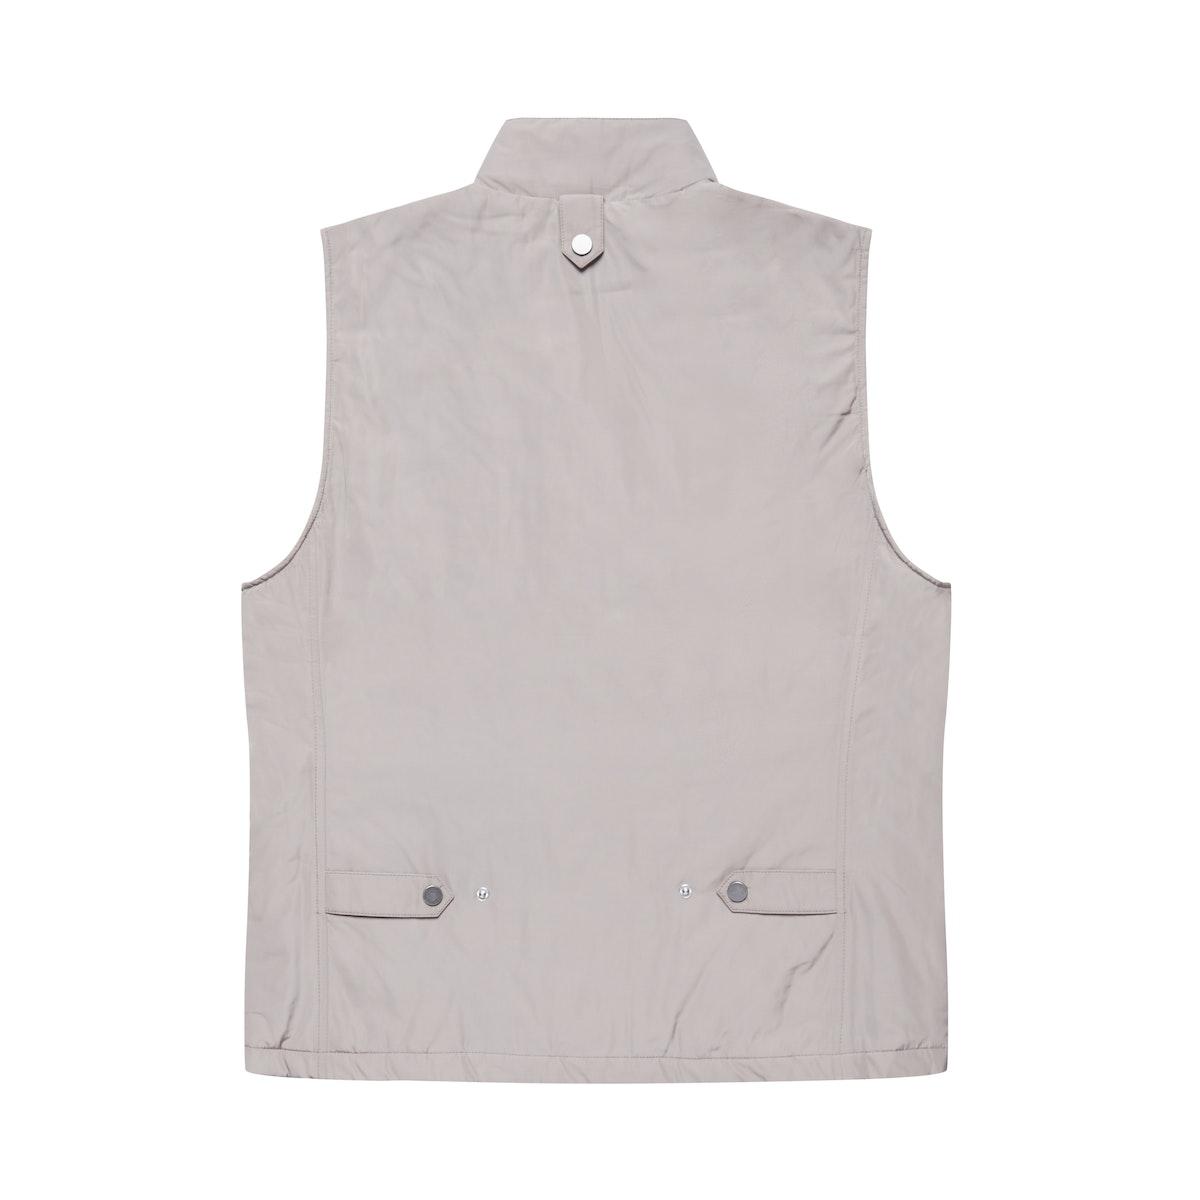 The Pemberton Taupe Vest